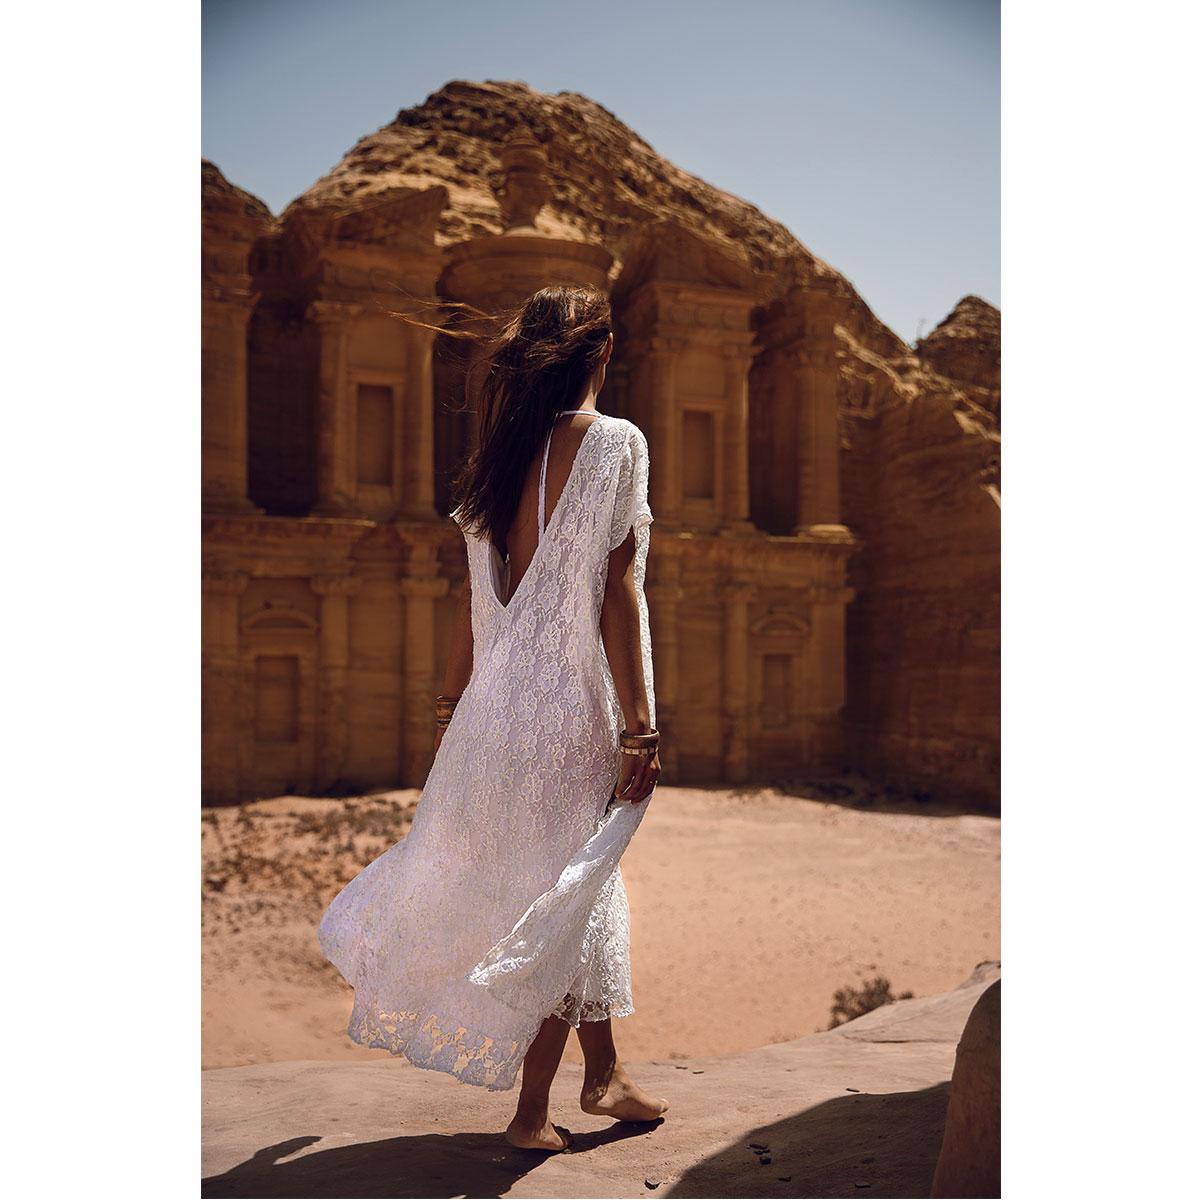 4285479a77a Robes bohème - Collection 2018 Sundress sur Monpetitbikini